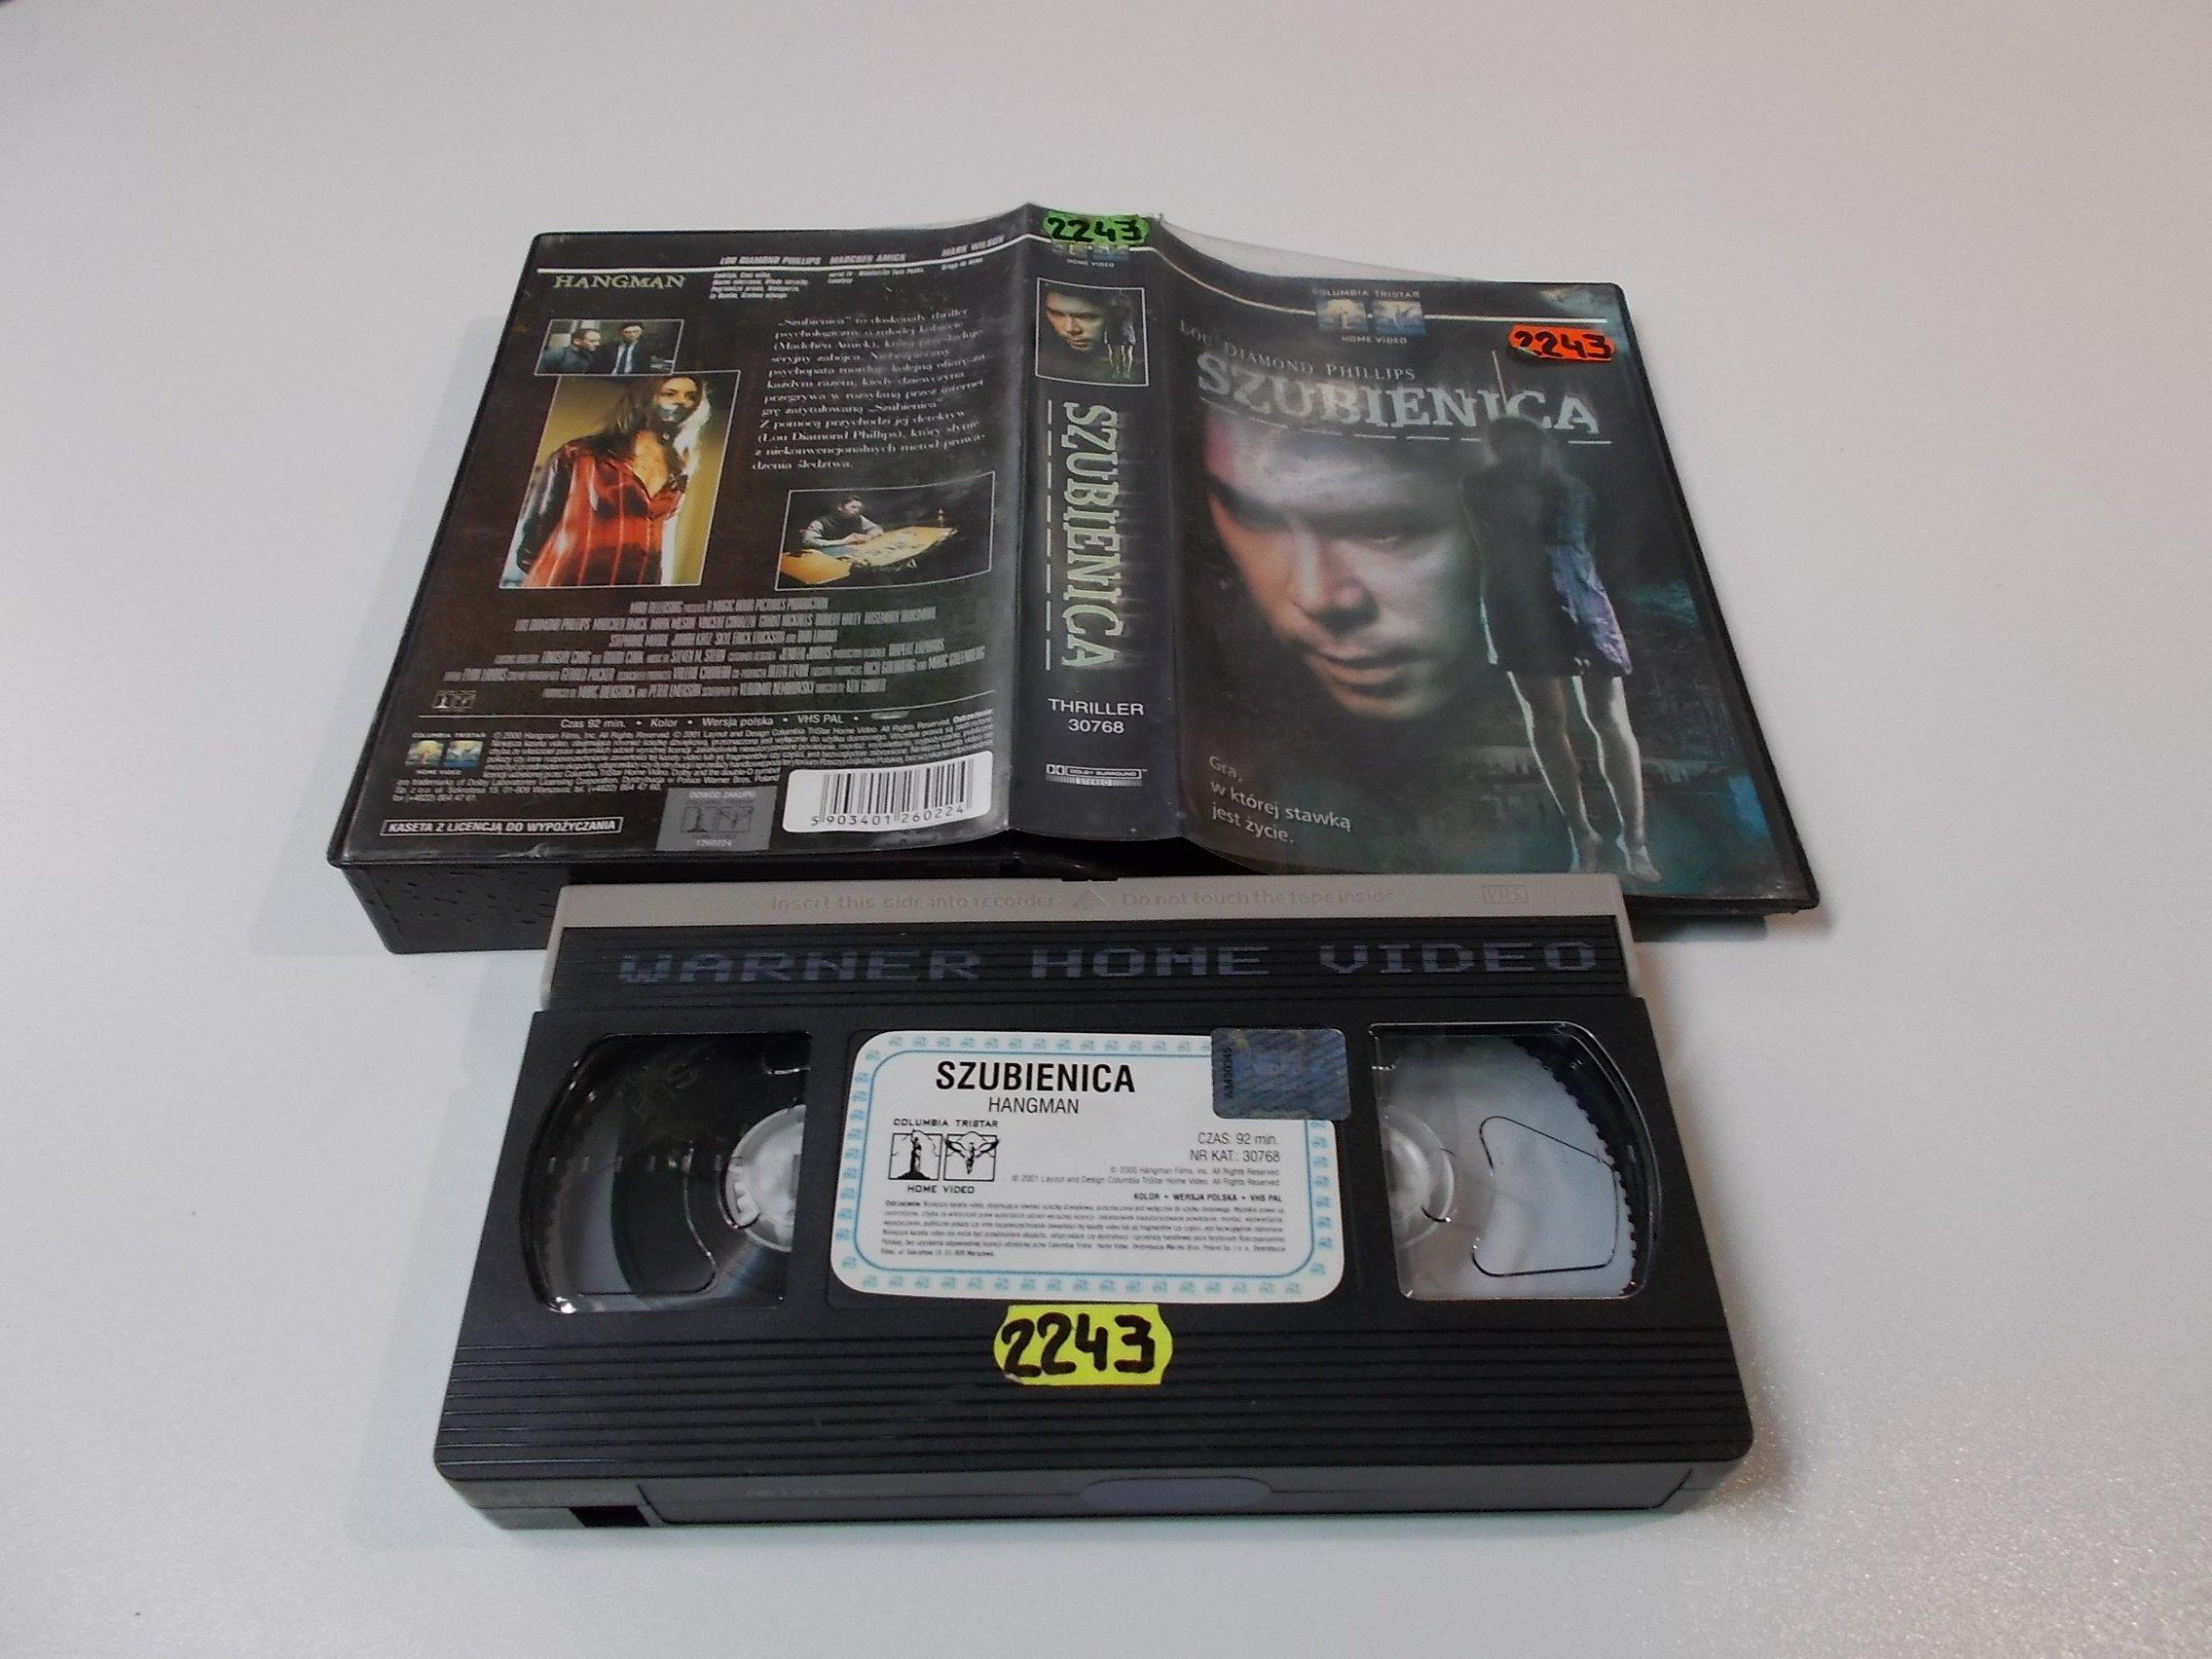 SZUBIENICA - VHS Kaseta Video - Opole 1602